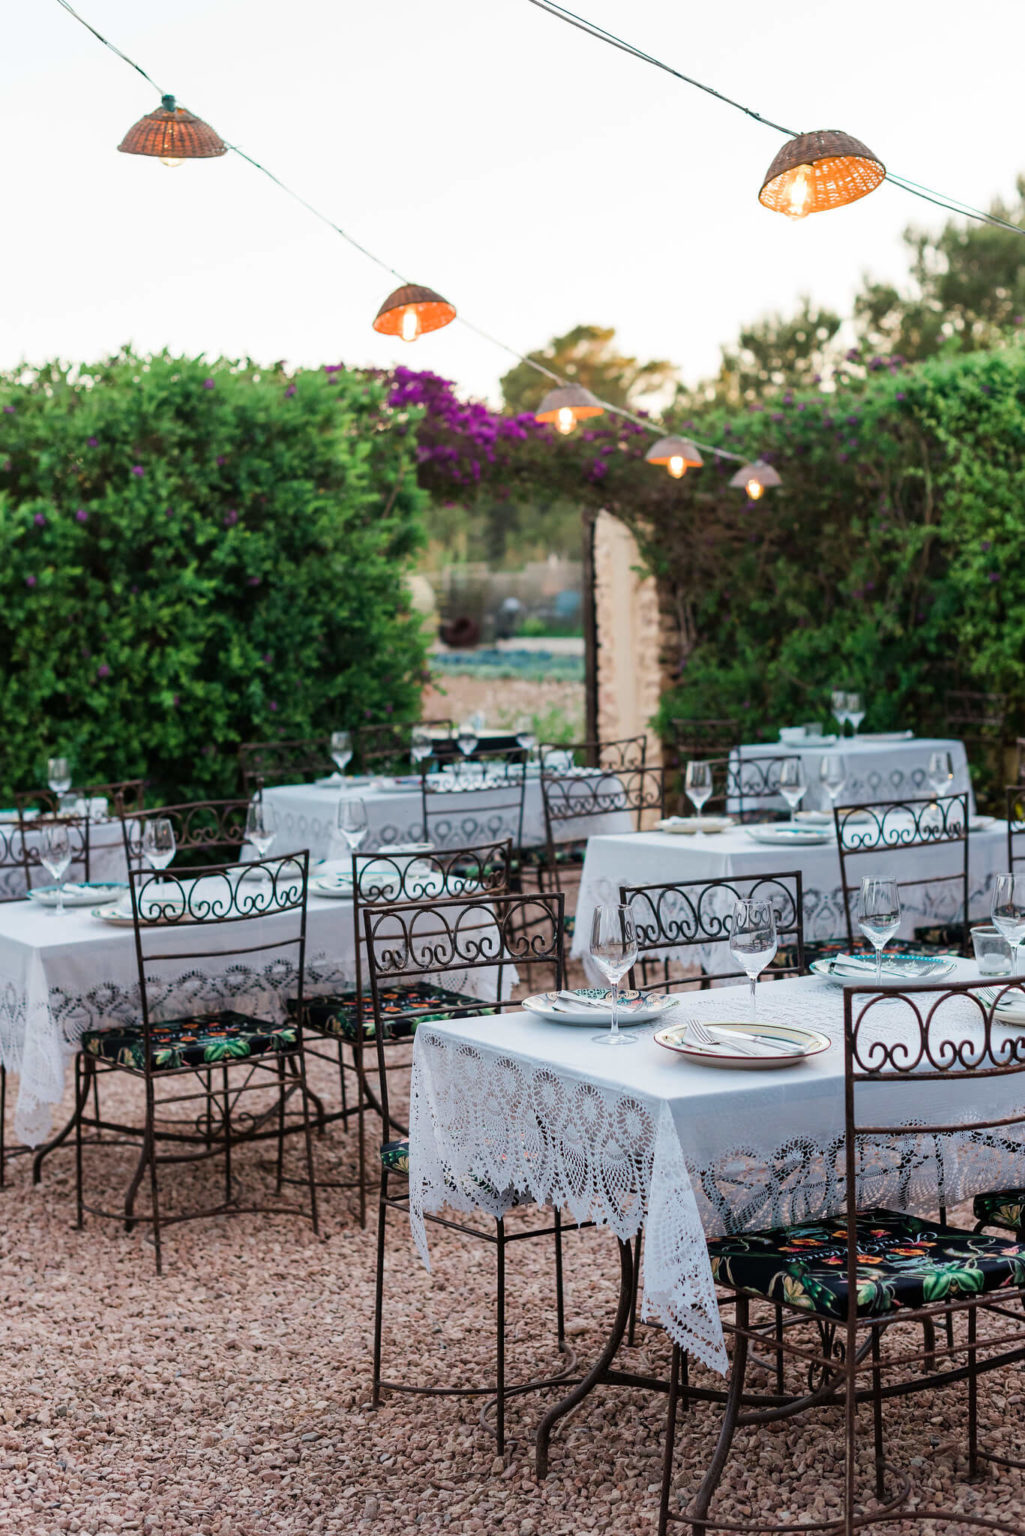 https://www.white-ibiza.com/wp-content/uploads/2020/03/formentera-restaurants-a-mi-manera-2020-03-1025x1536.jpg